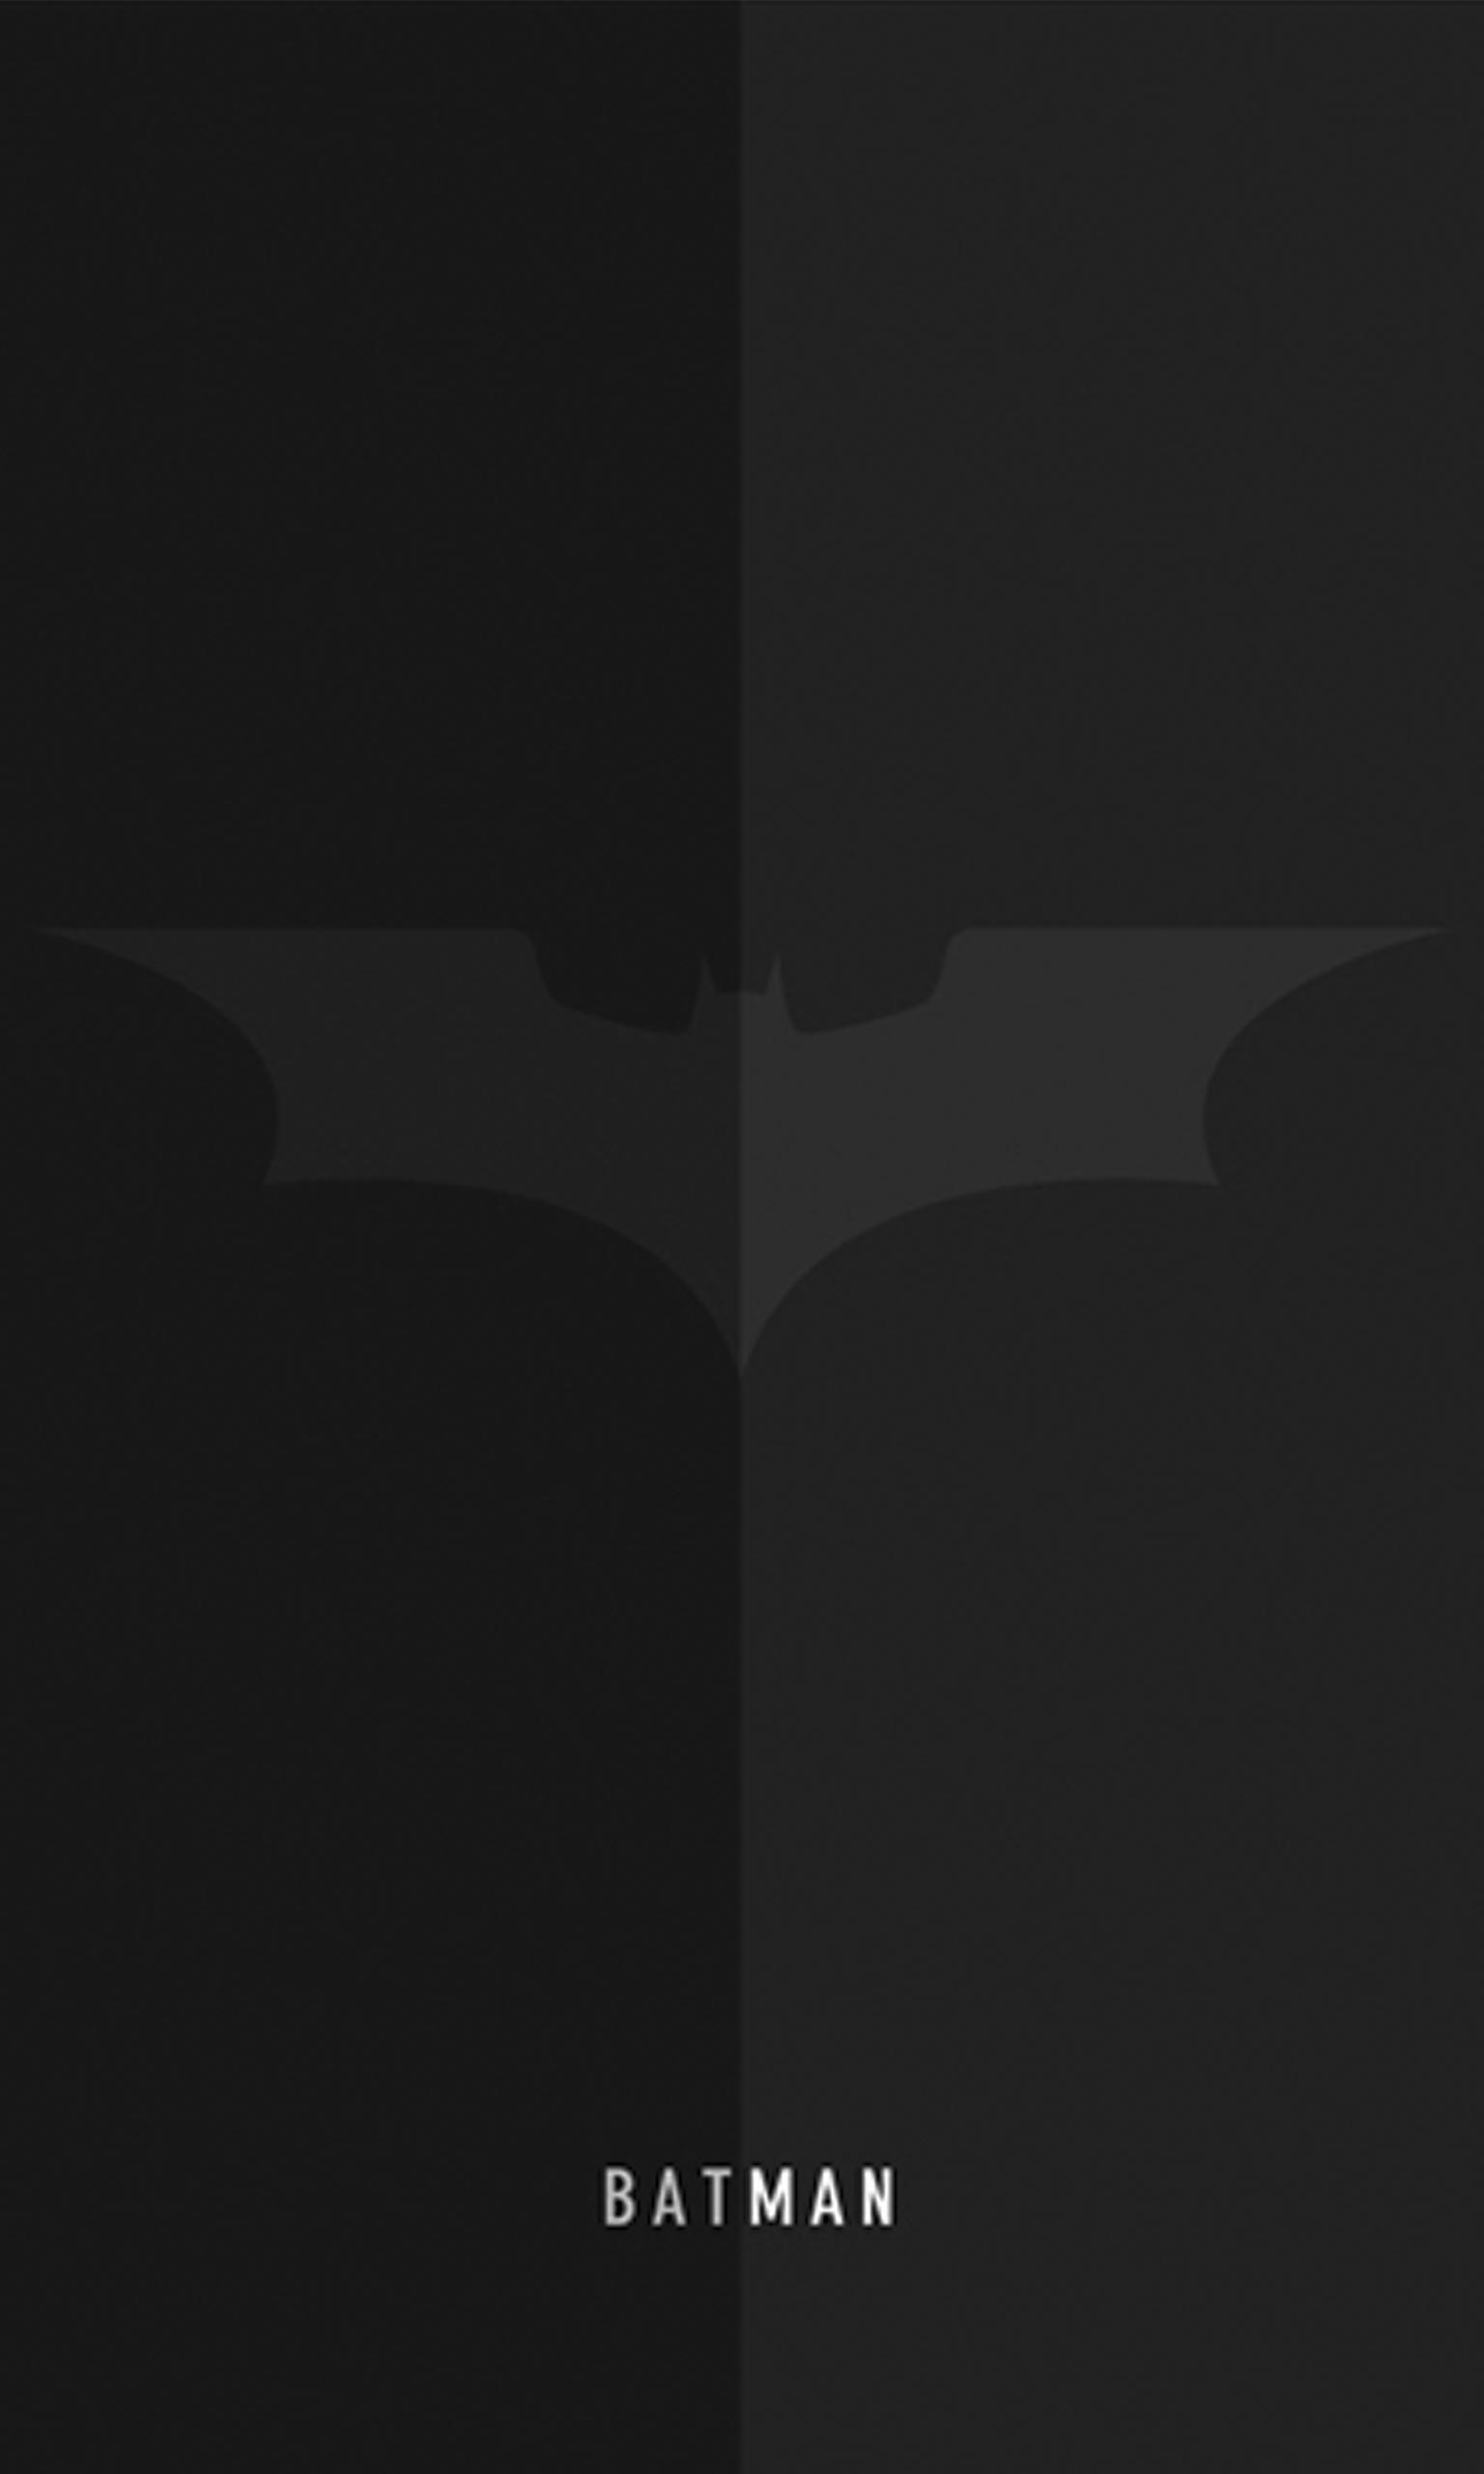 Download 200 Wallpaper Android Mobil HD Gratis